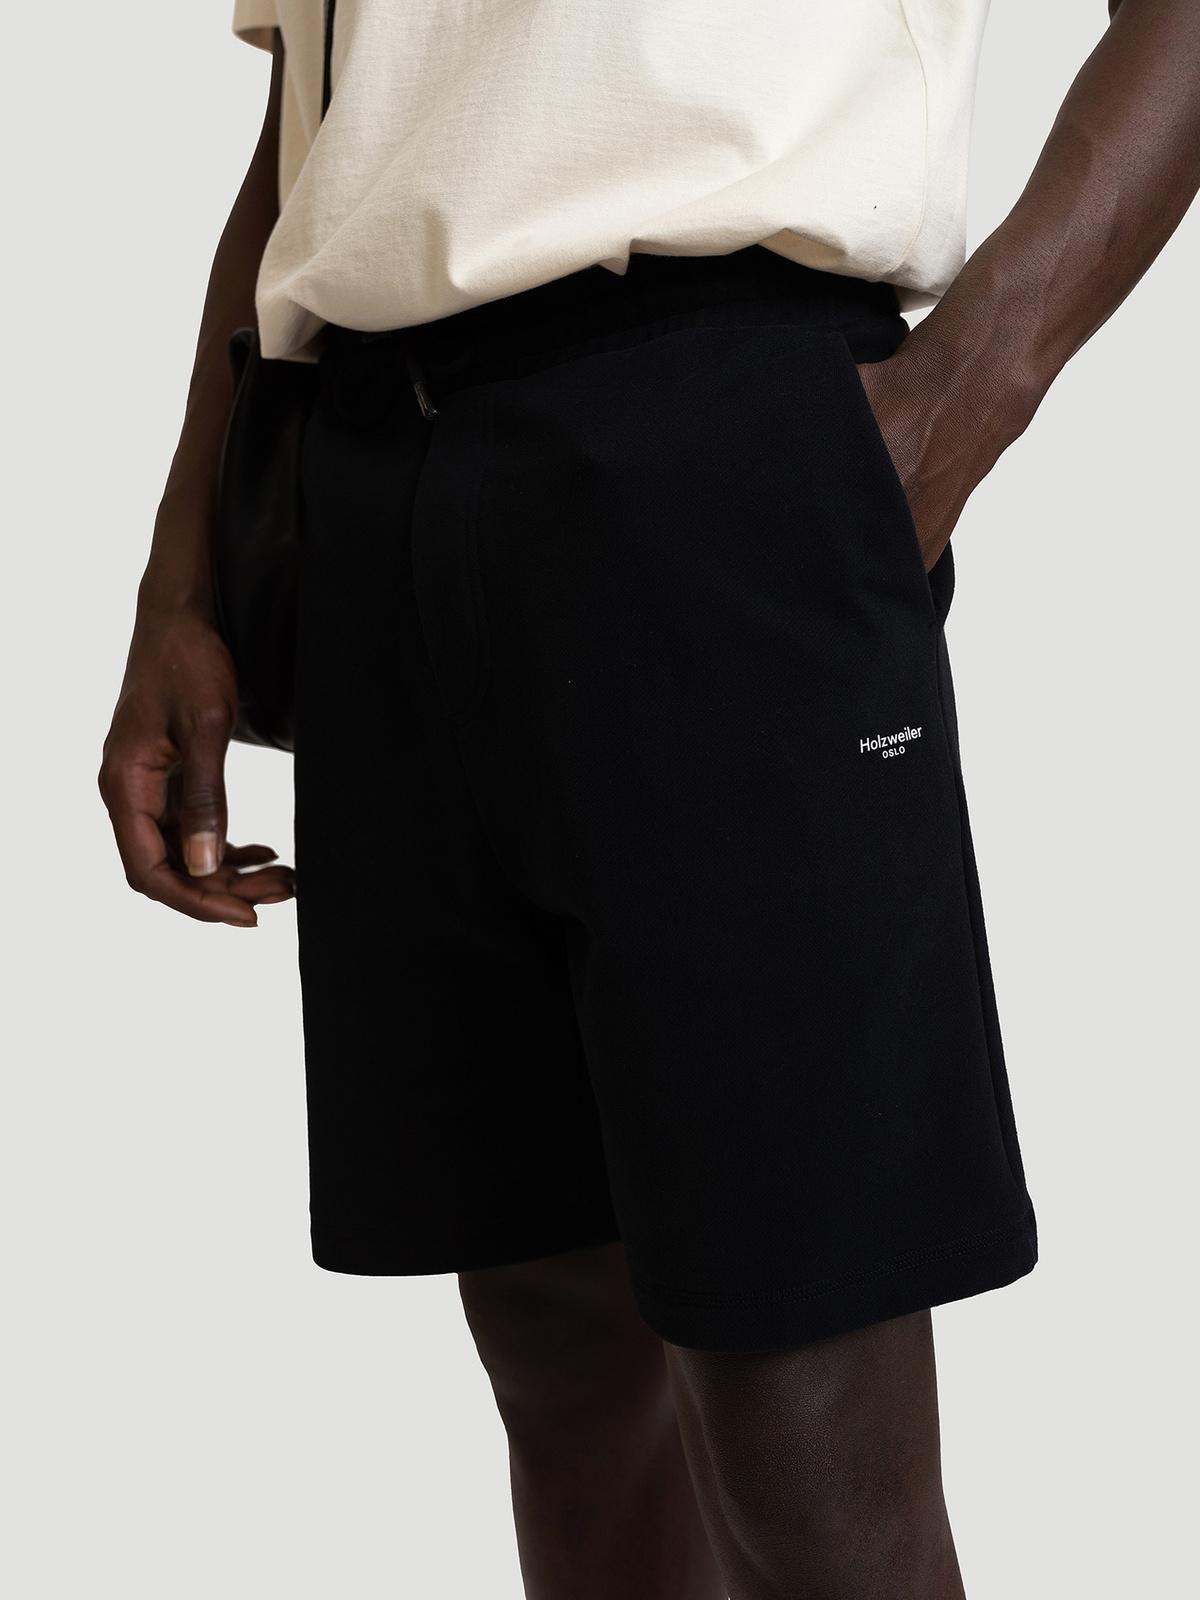 M. Oslo Shorts Black 1